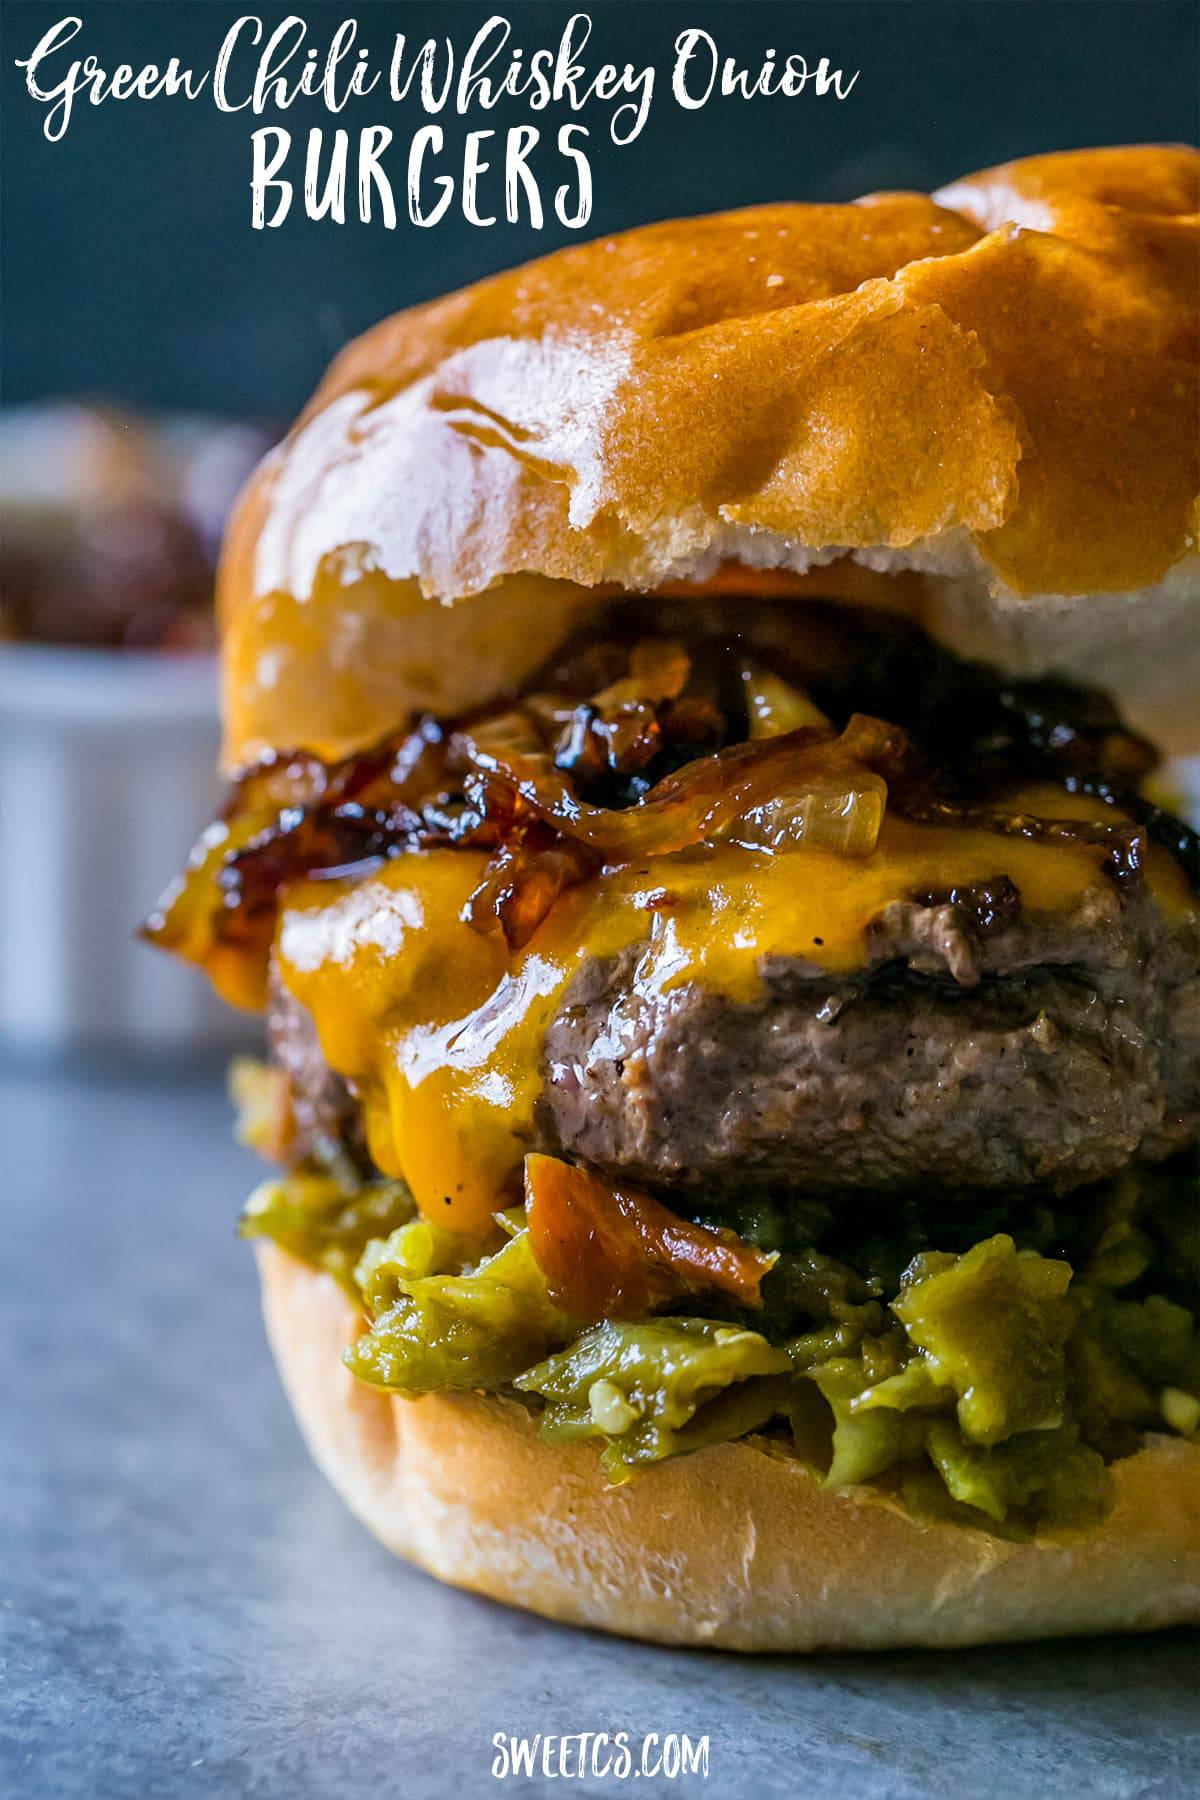 Green Chili Whiskey Onion Burger in a bun